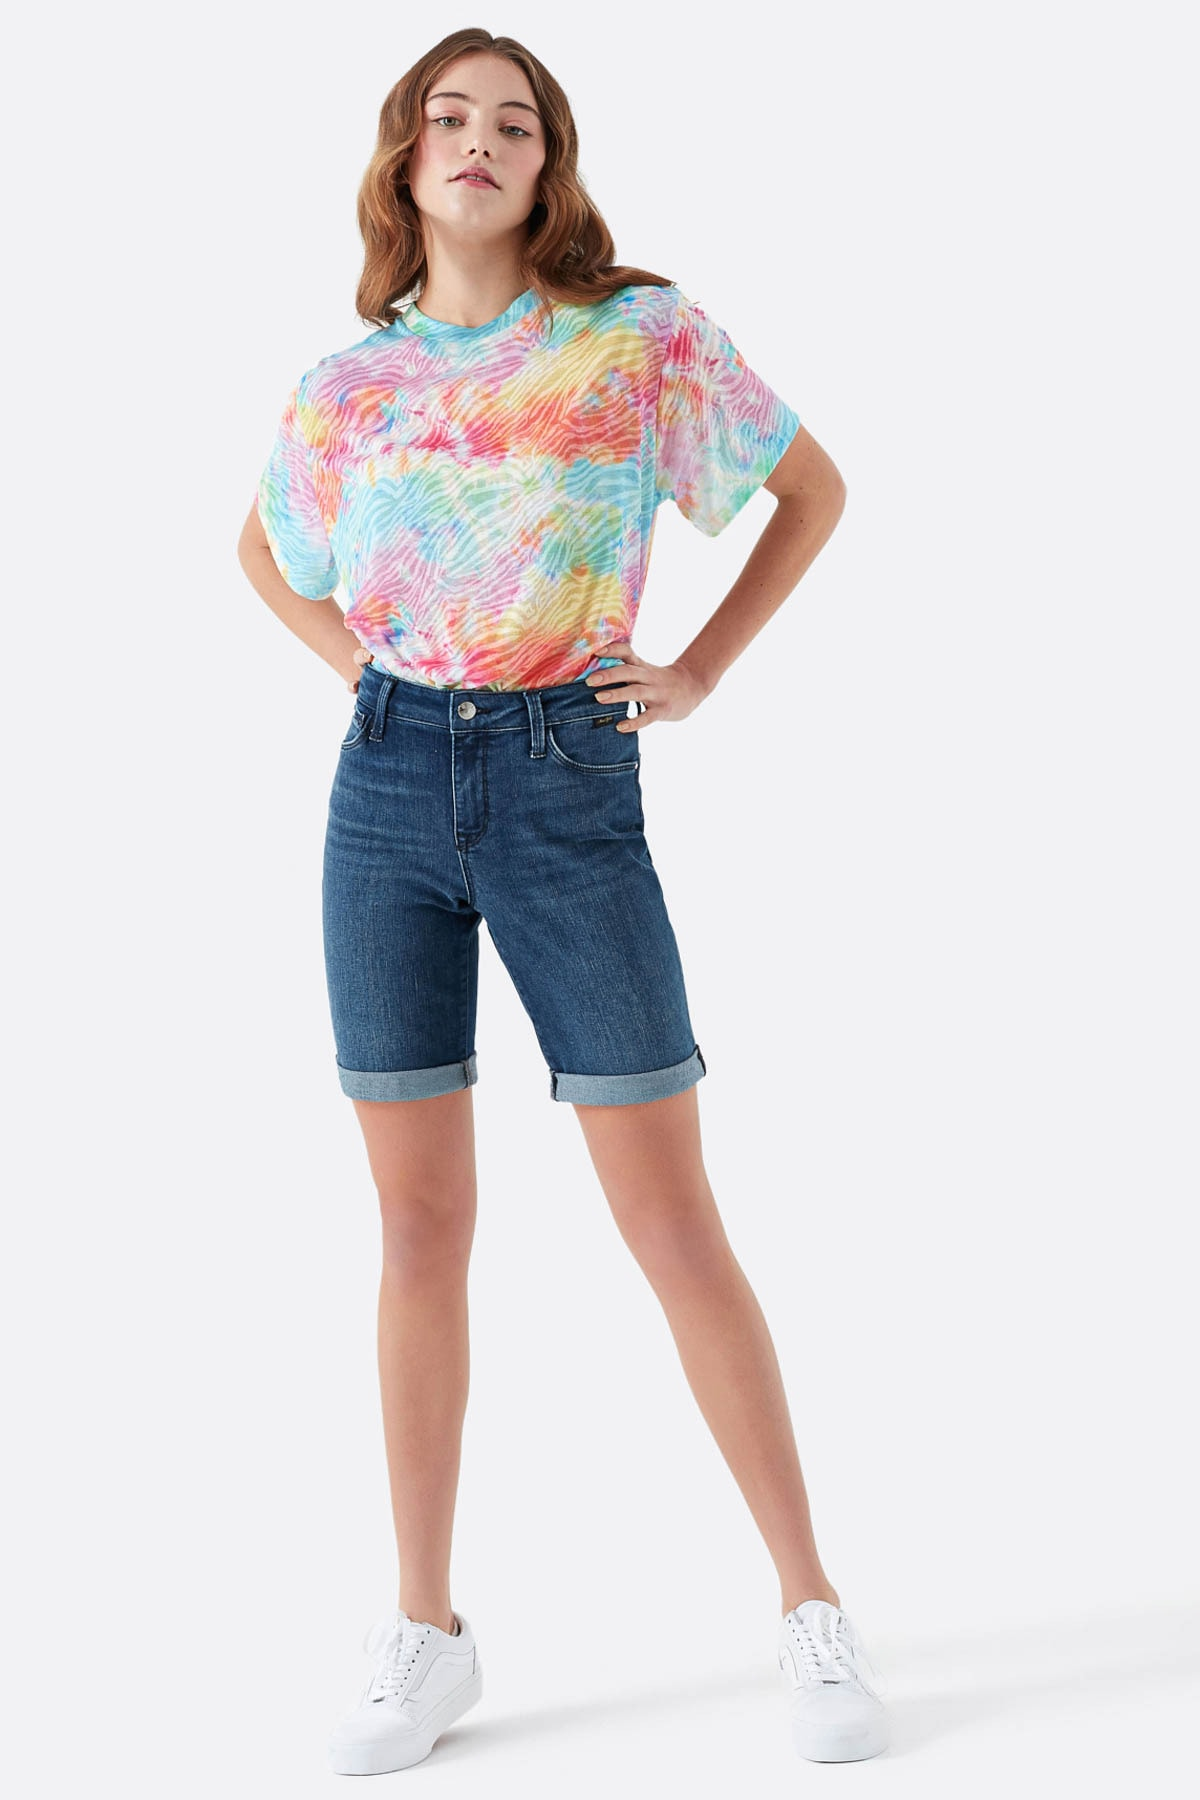 Mavi Kadın Alexis Gold Lux Move Jean Şort 1441528584 2